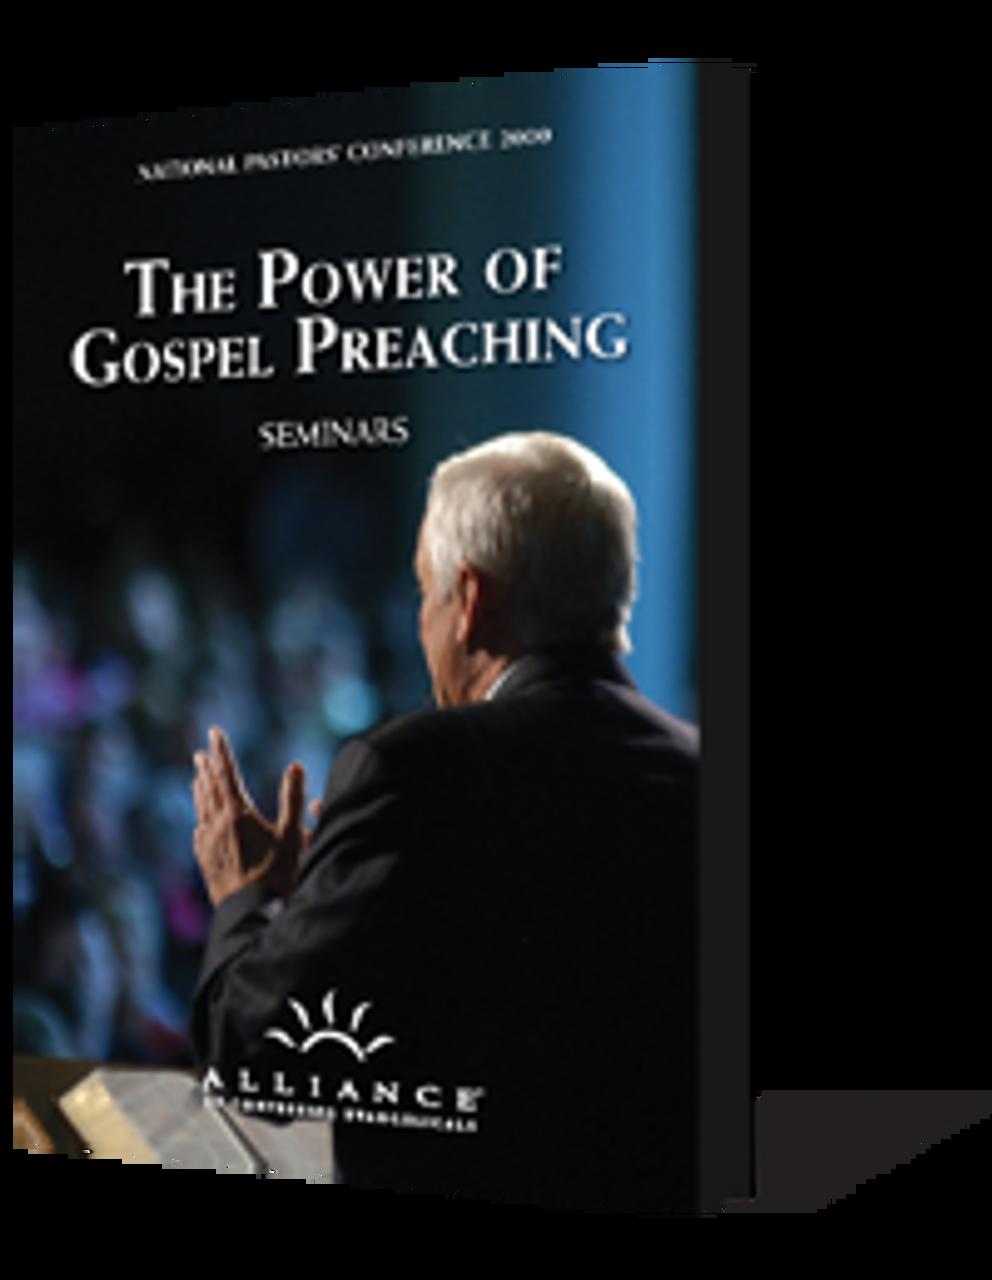 Jonathan Edwards: The Preacher (mp3 Download)